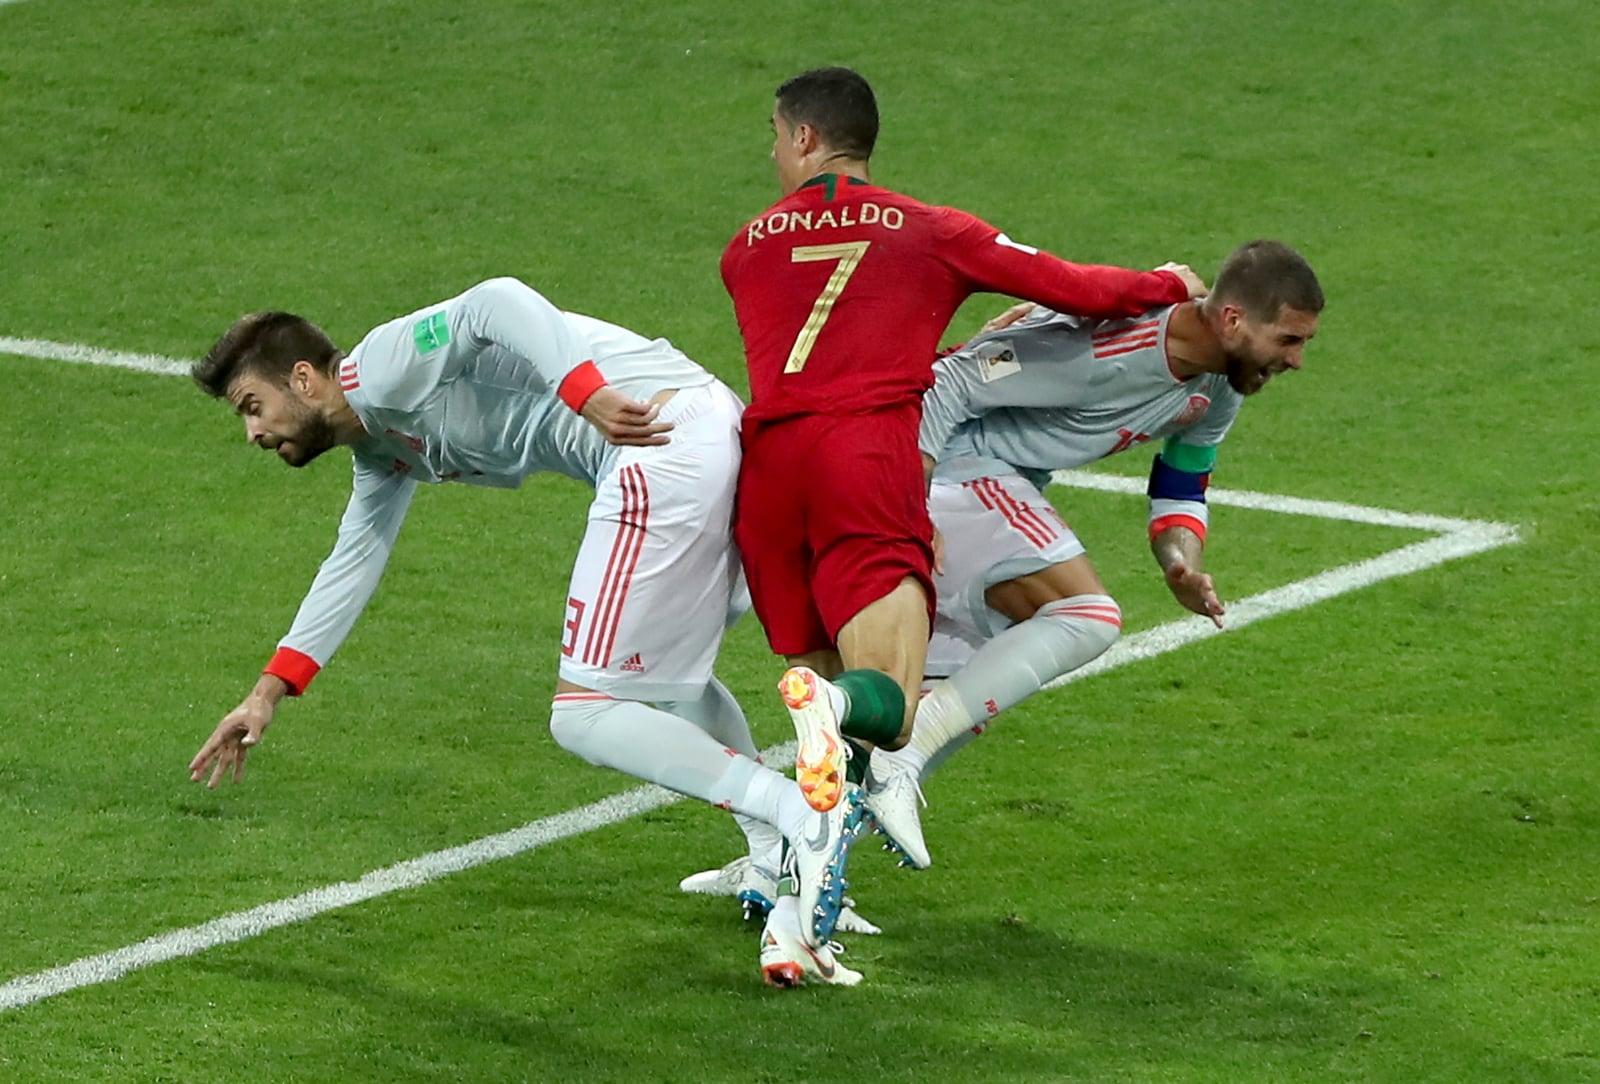 Mecz Hiszpania - Portugalia Mundial 2018 fot. EPA/MOHAMED MESSARA